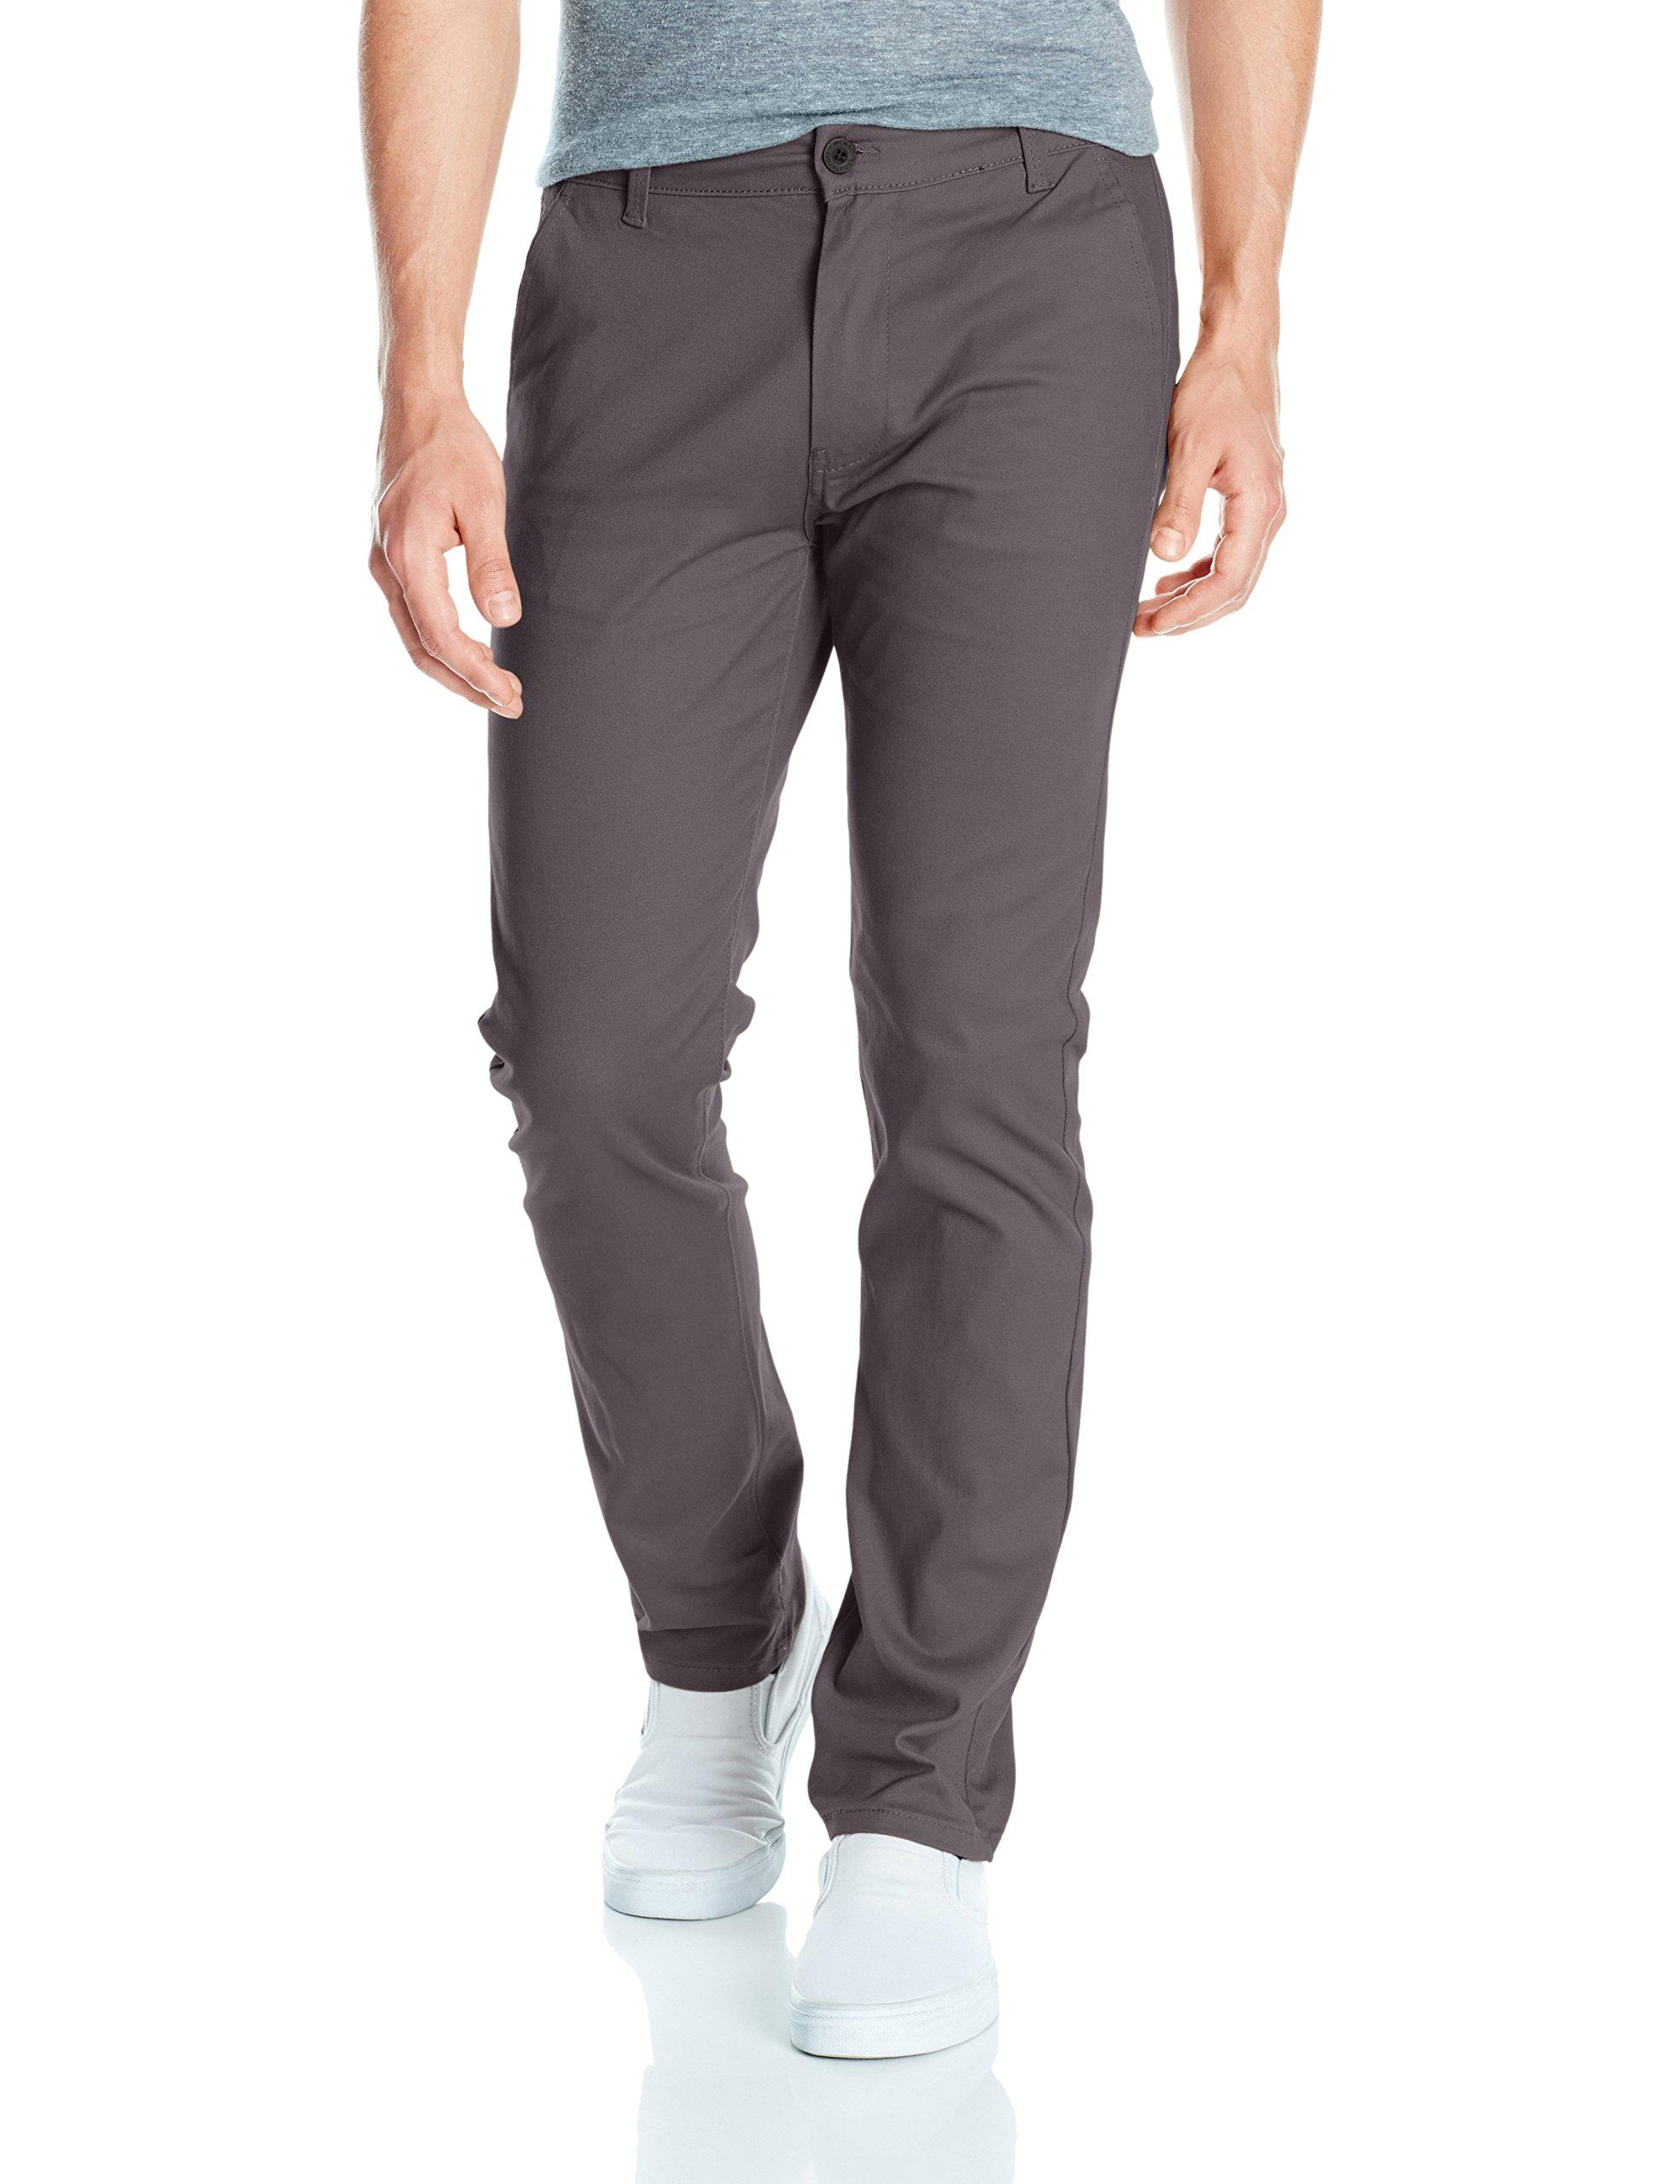 Southpole Men's Flex Stretch Basic Long Chino Pants, Dark Slate (New), 34X32